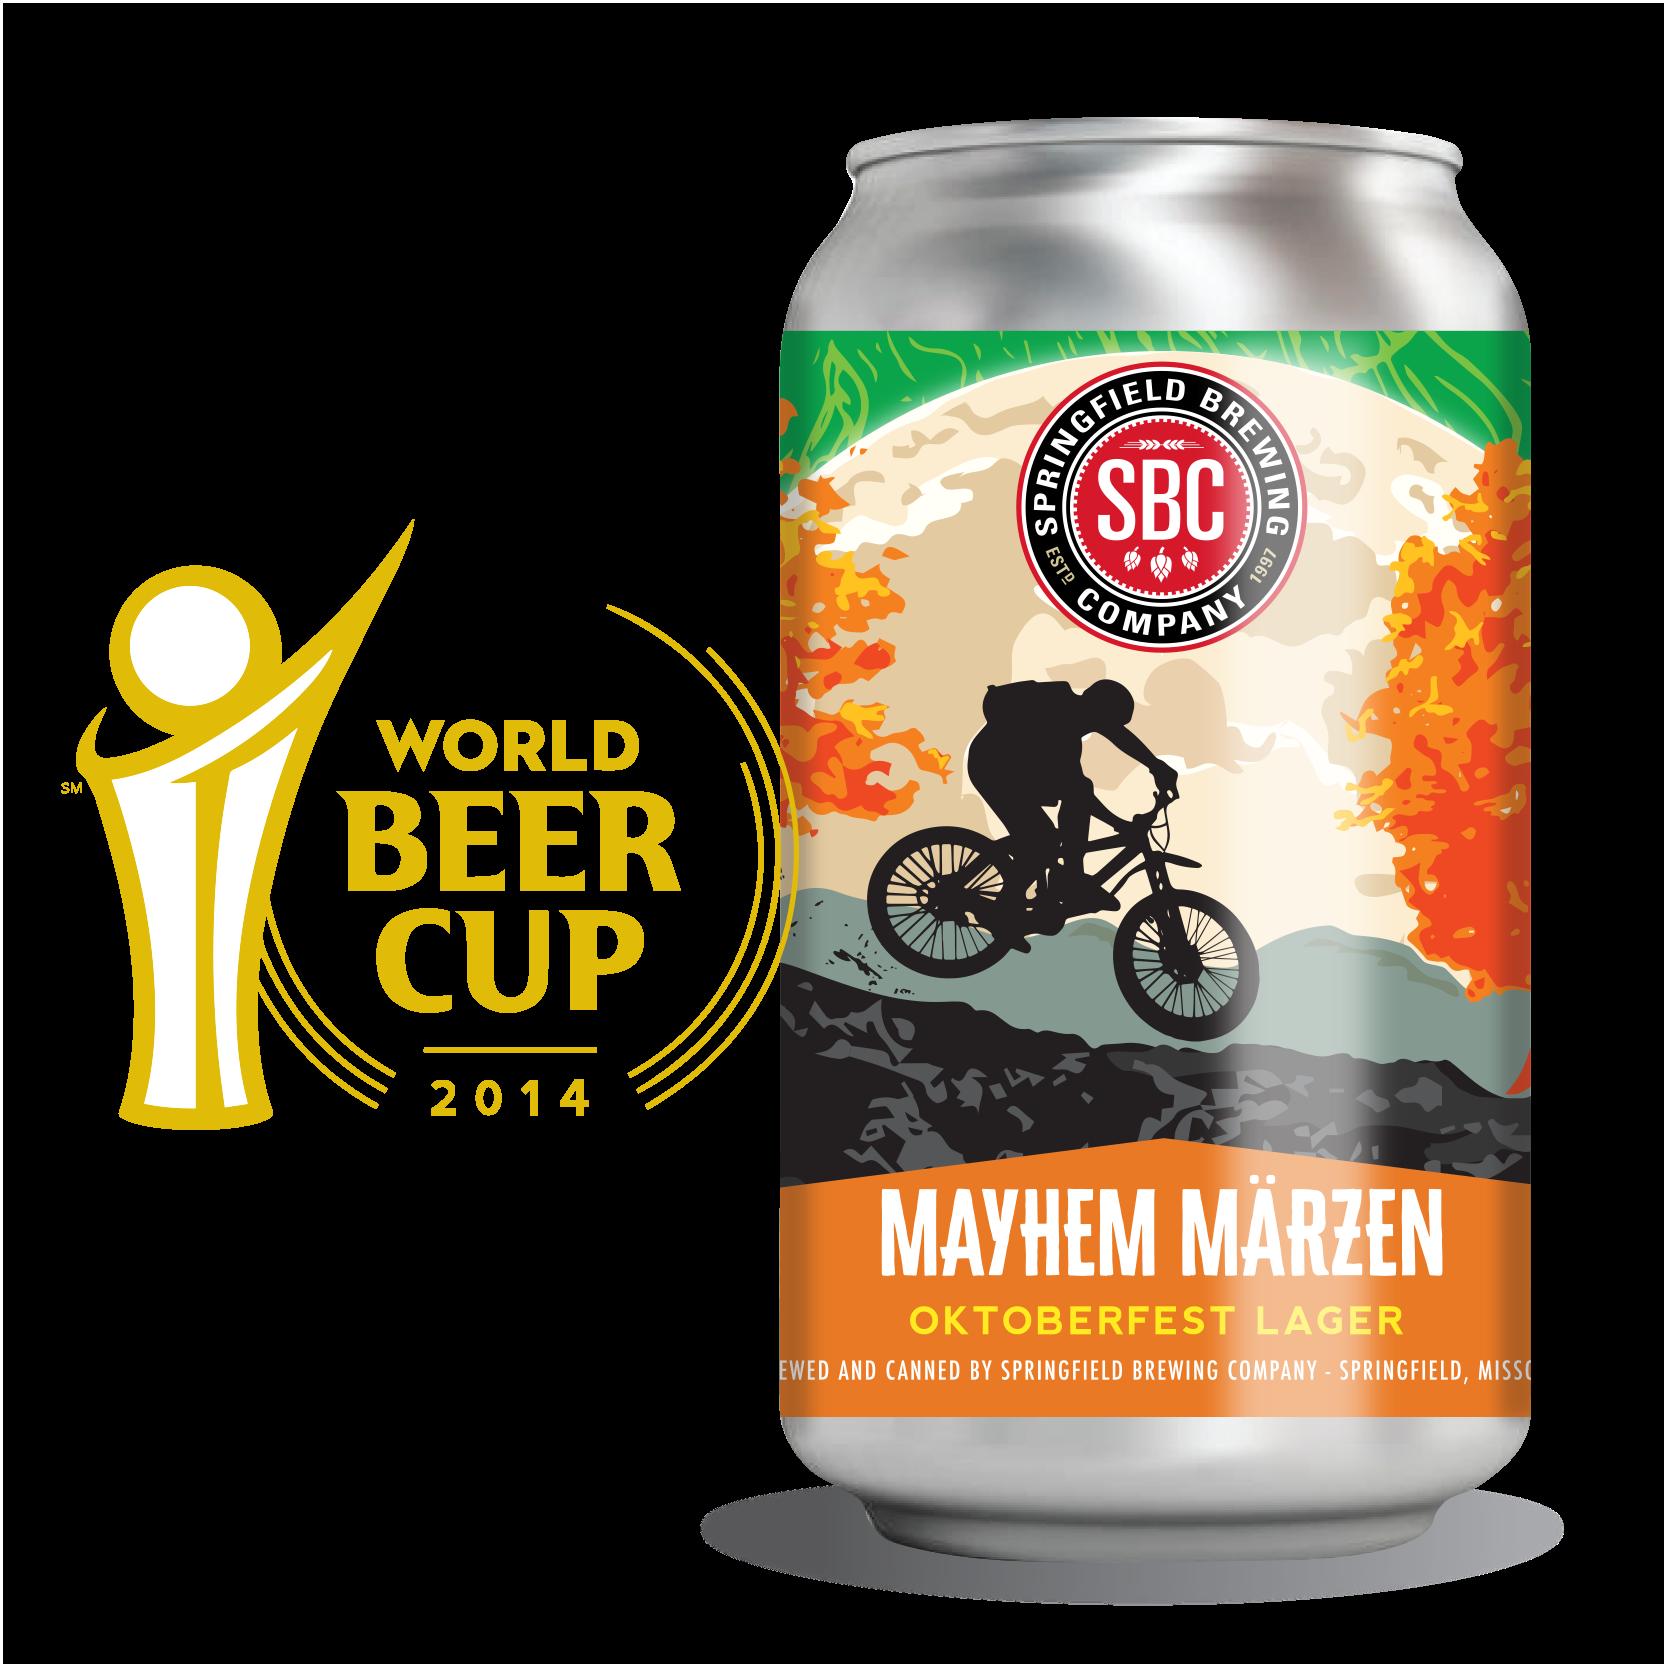 https://brewery.springfieldbrewingco.com/wp-content/uploads/2021/07/WBC2014_Marzen.png